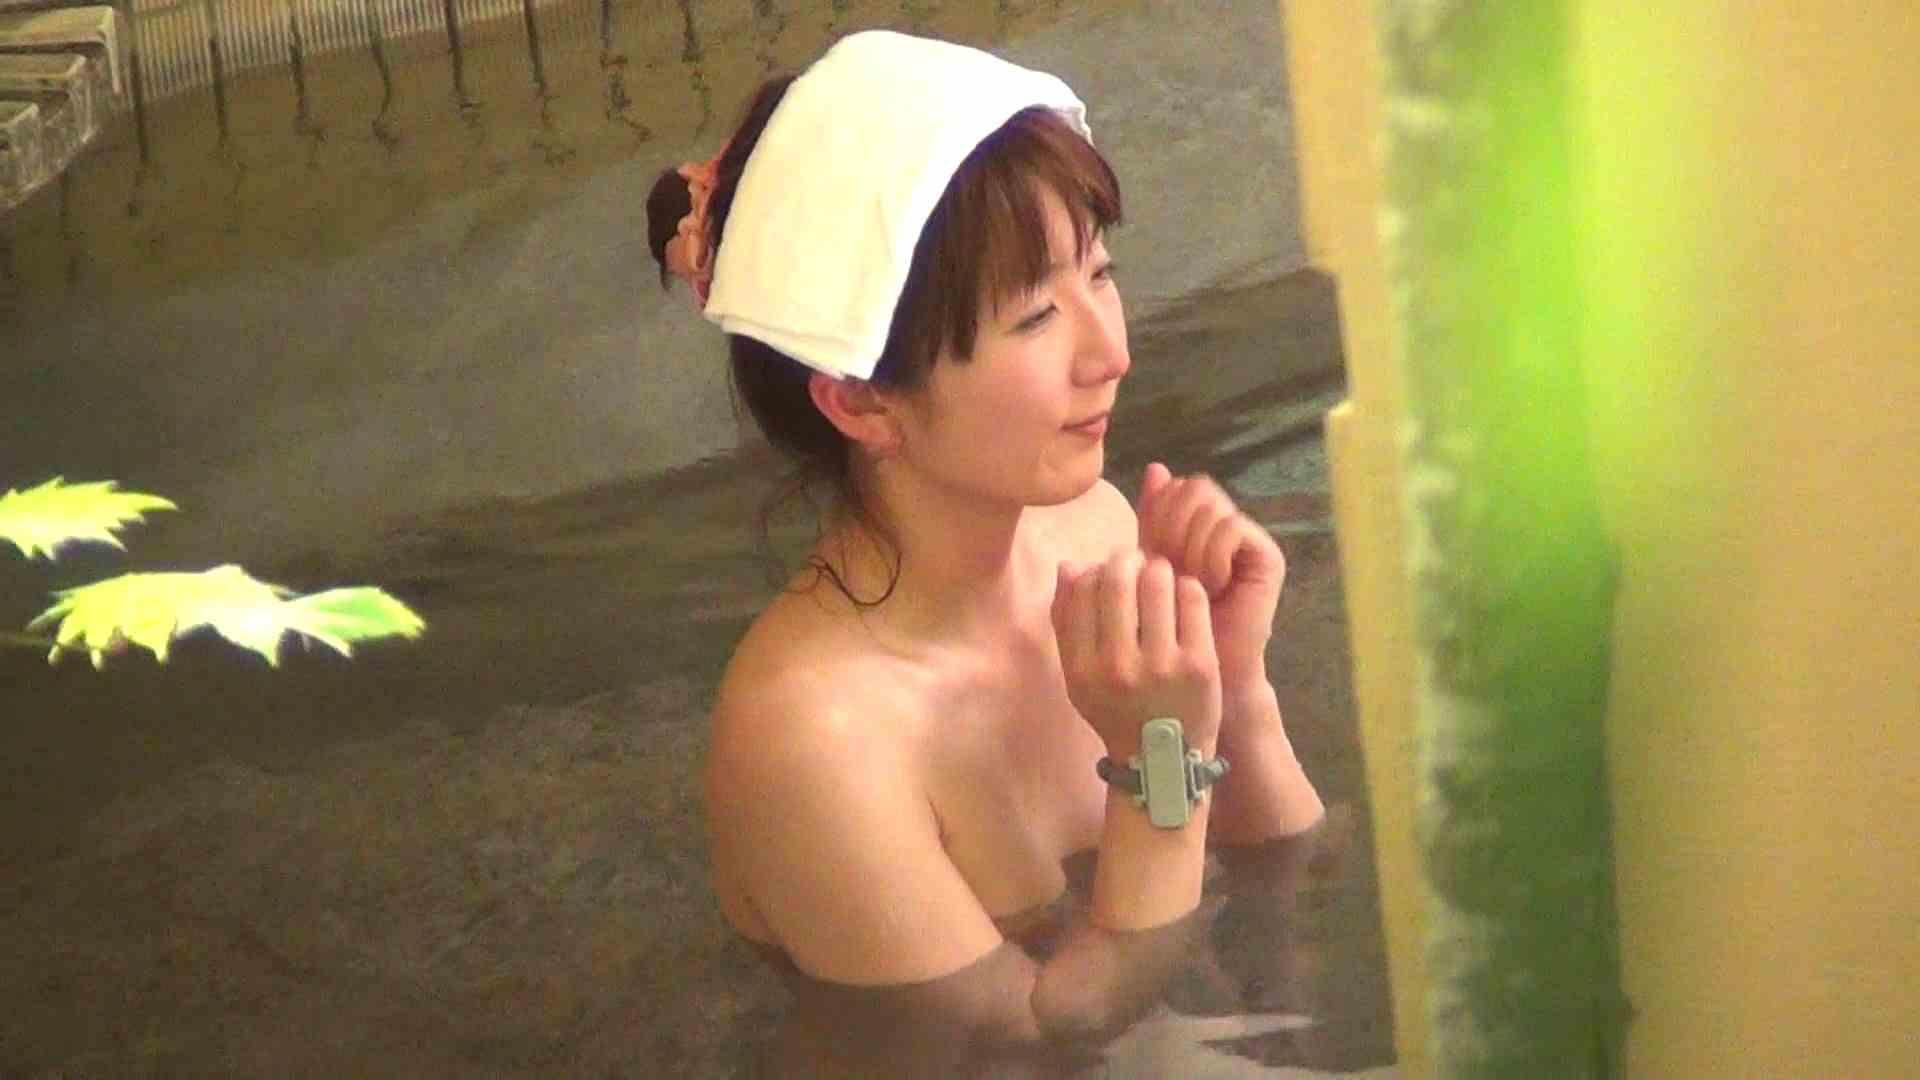 Aquaな露天風呂Vol.251 露天   HなOL  76pic 54